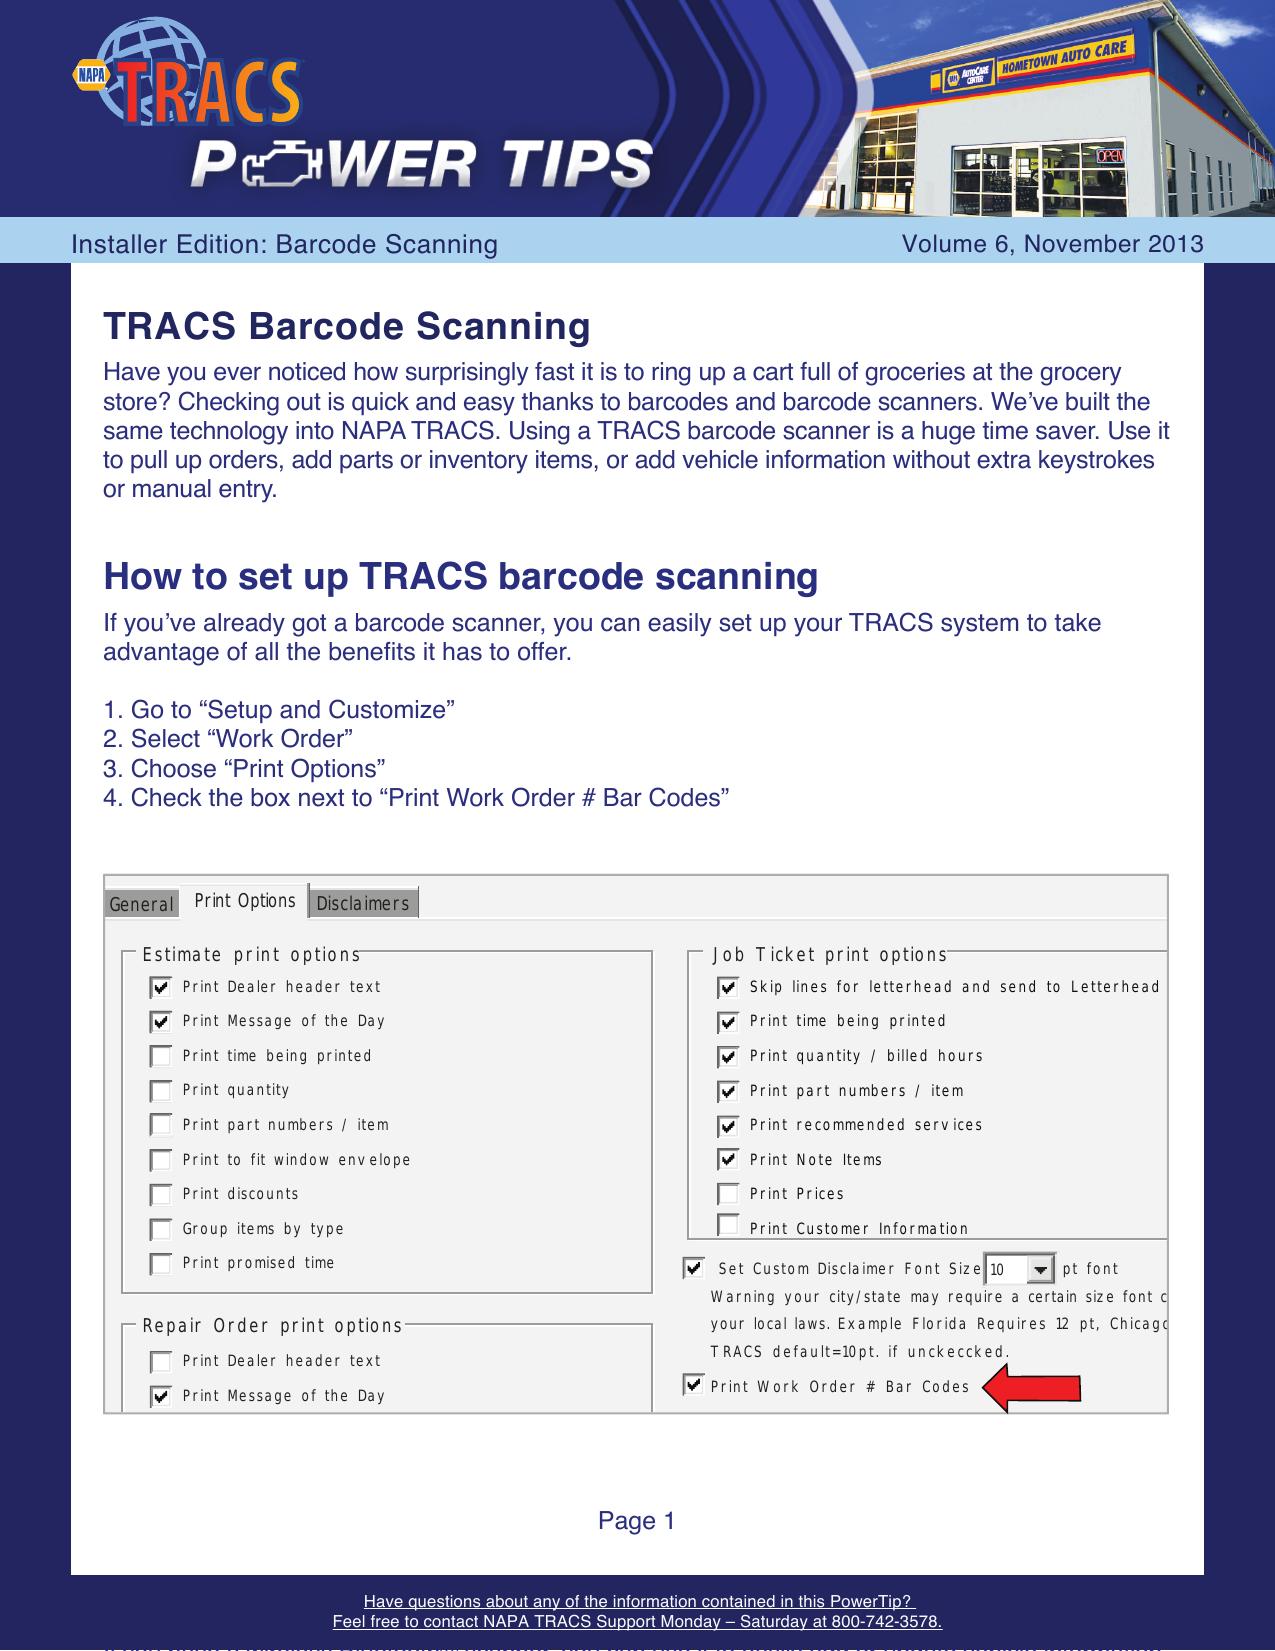 1113 TRACS Barcode Scanning | manualzz com